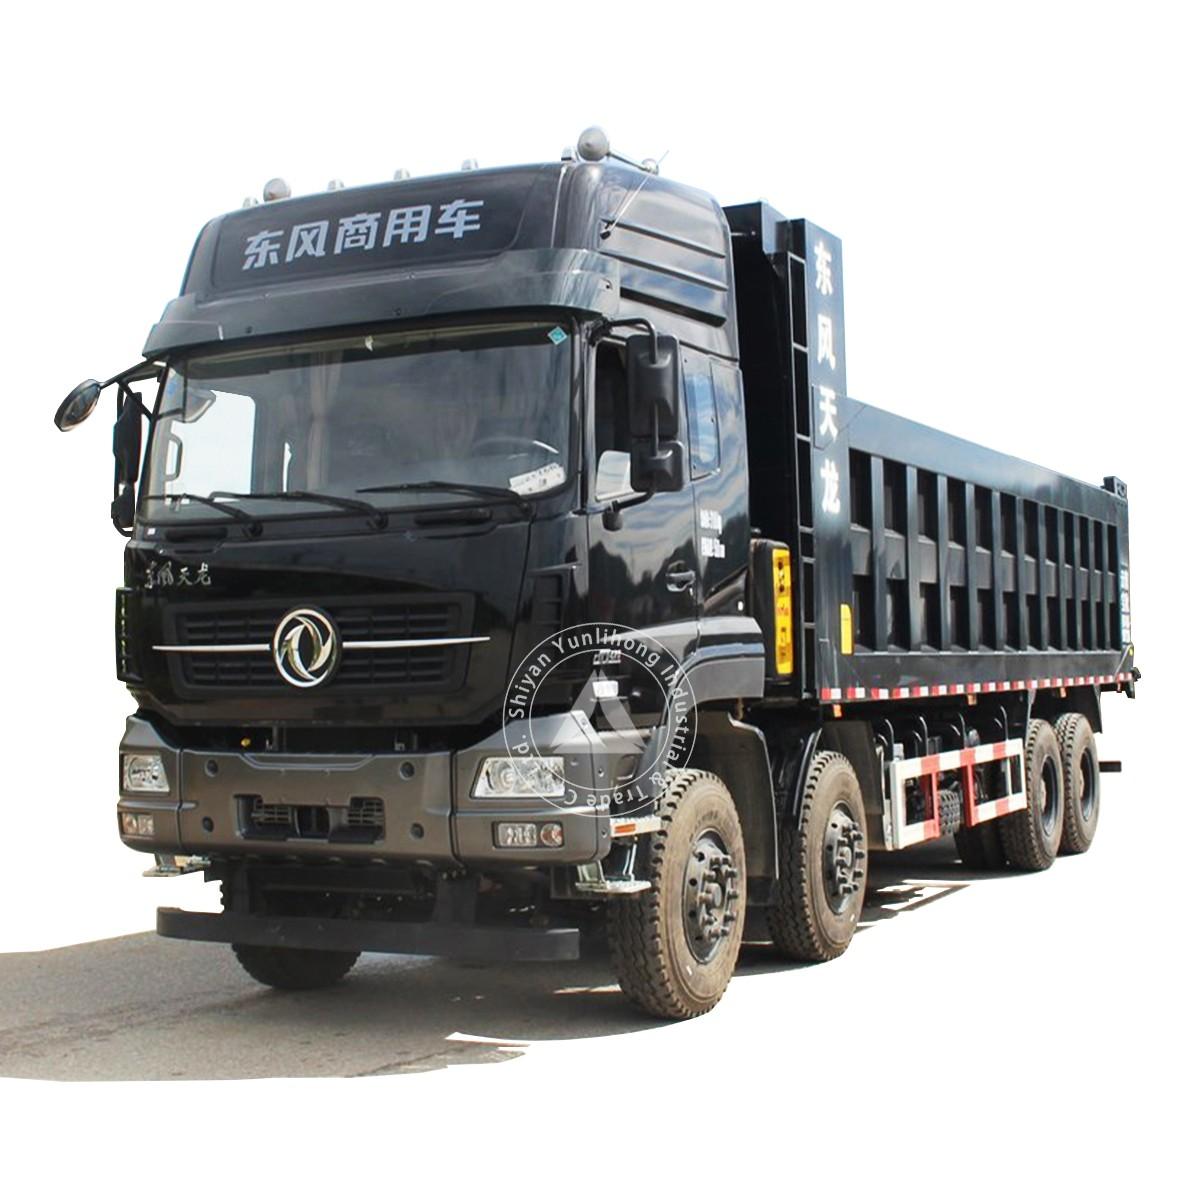 Dongfeng KC 8x4 GVW 40 Ton 23m3 To 30m3 Dump Truck